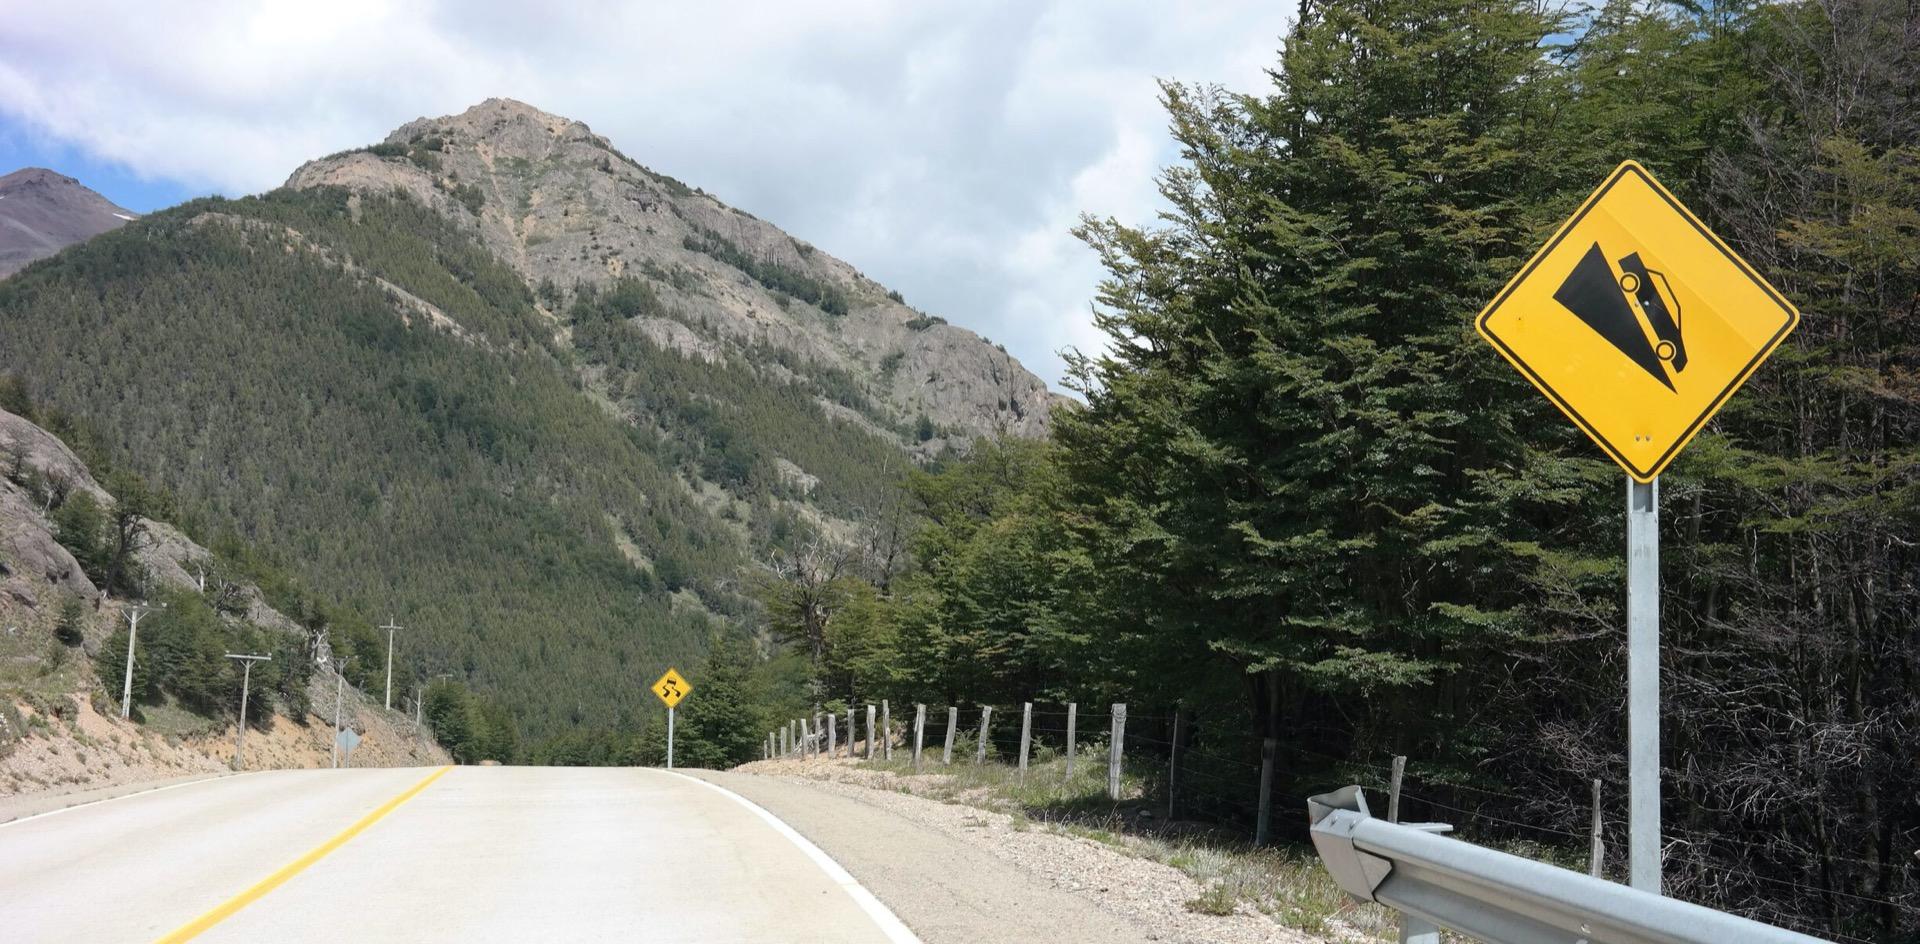 Carretera Austral weg